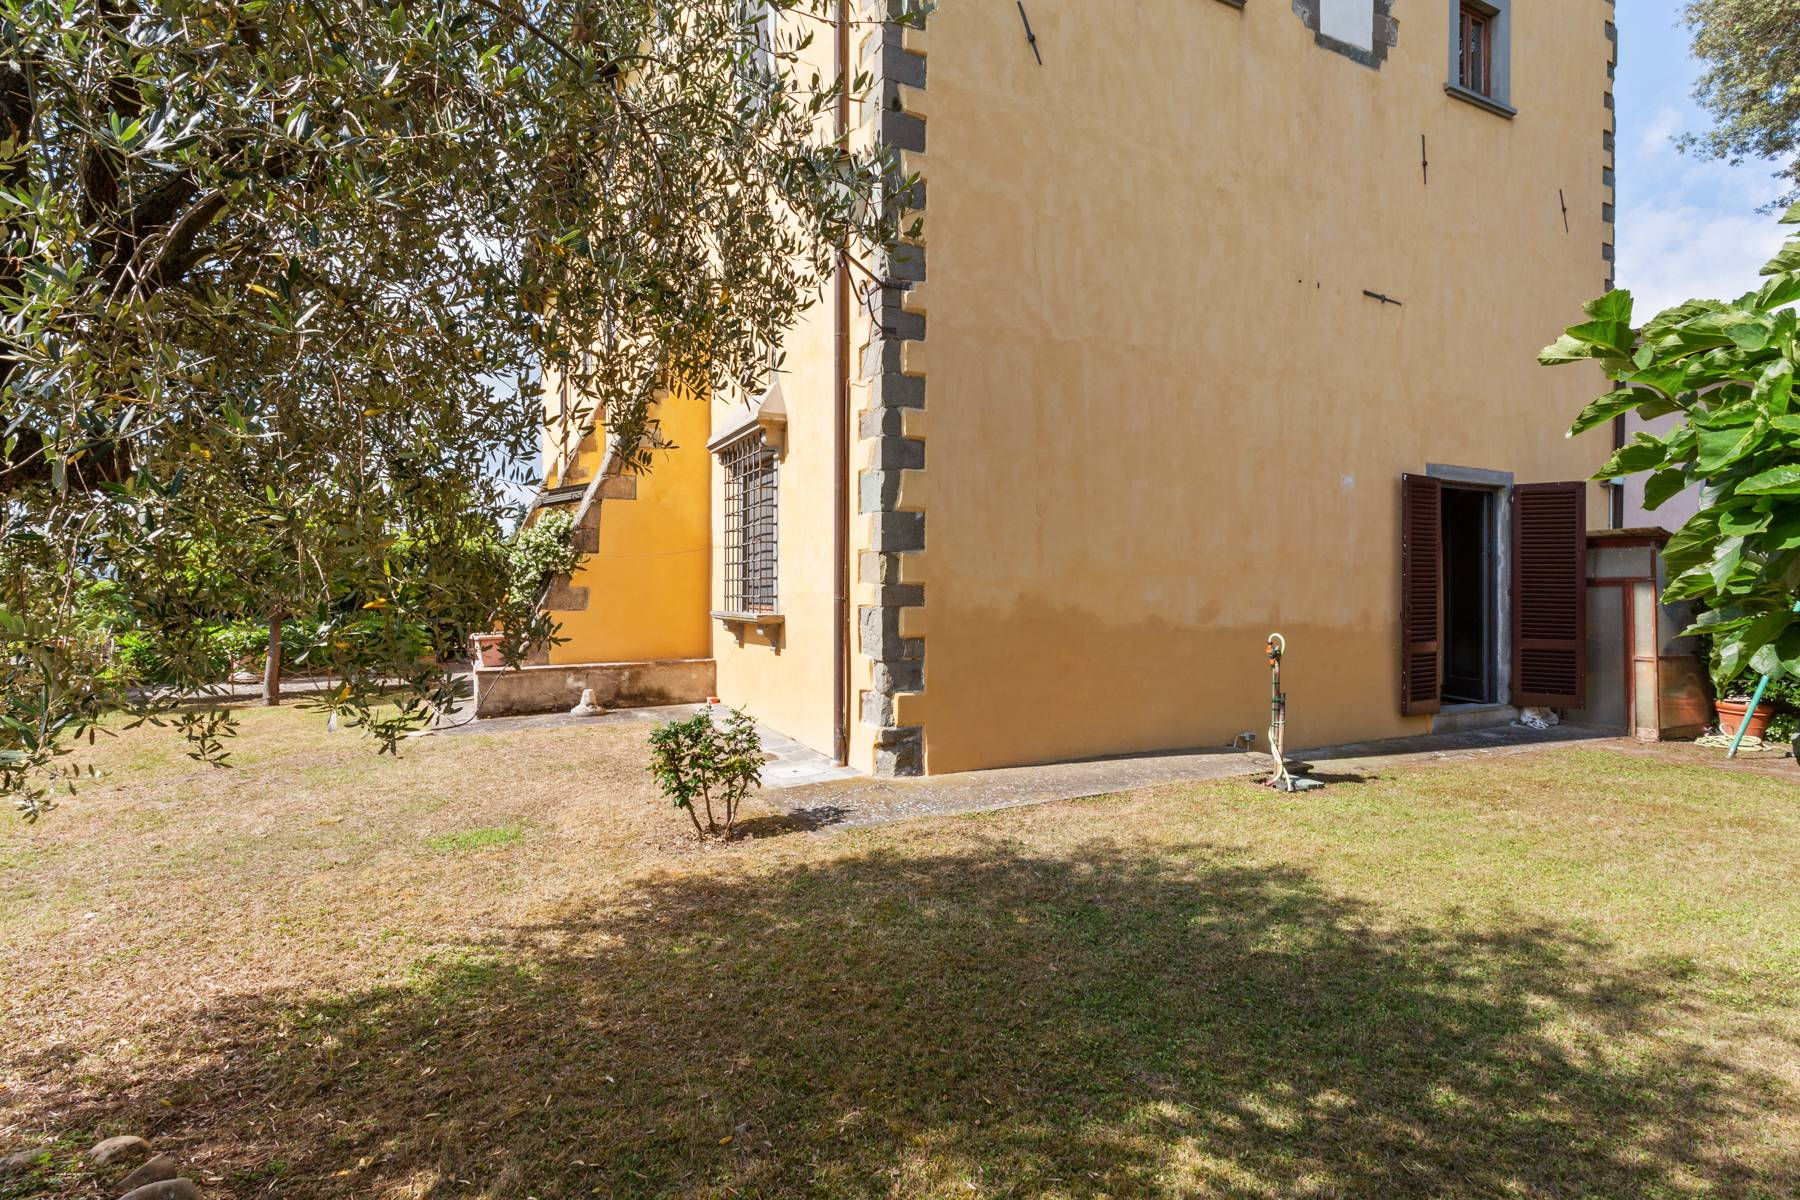 Appartamento in Vendita a Scandicci: 5 locali, 140 mq - Foto 16